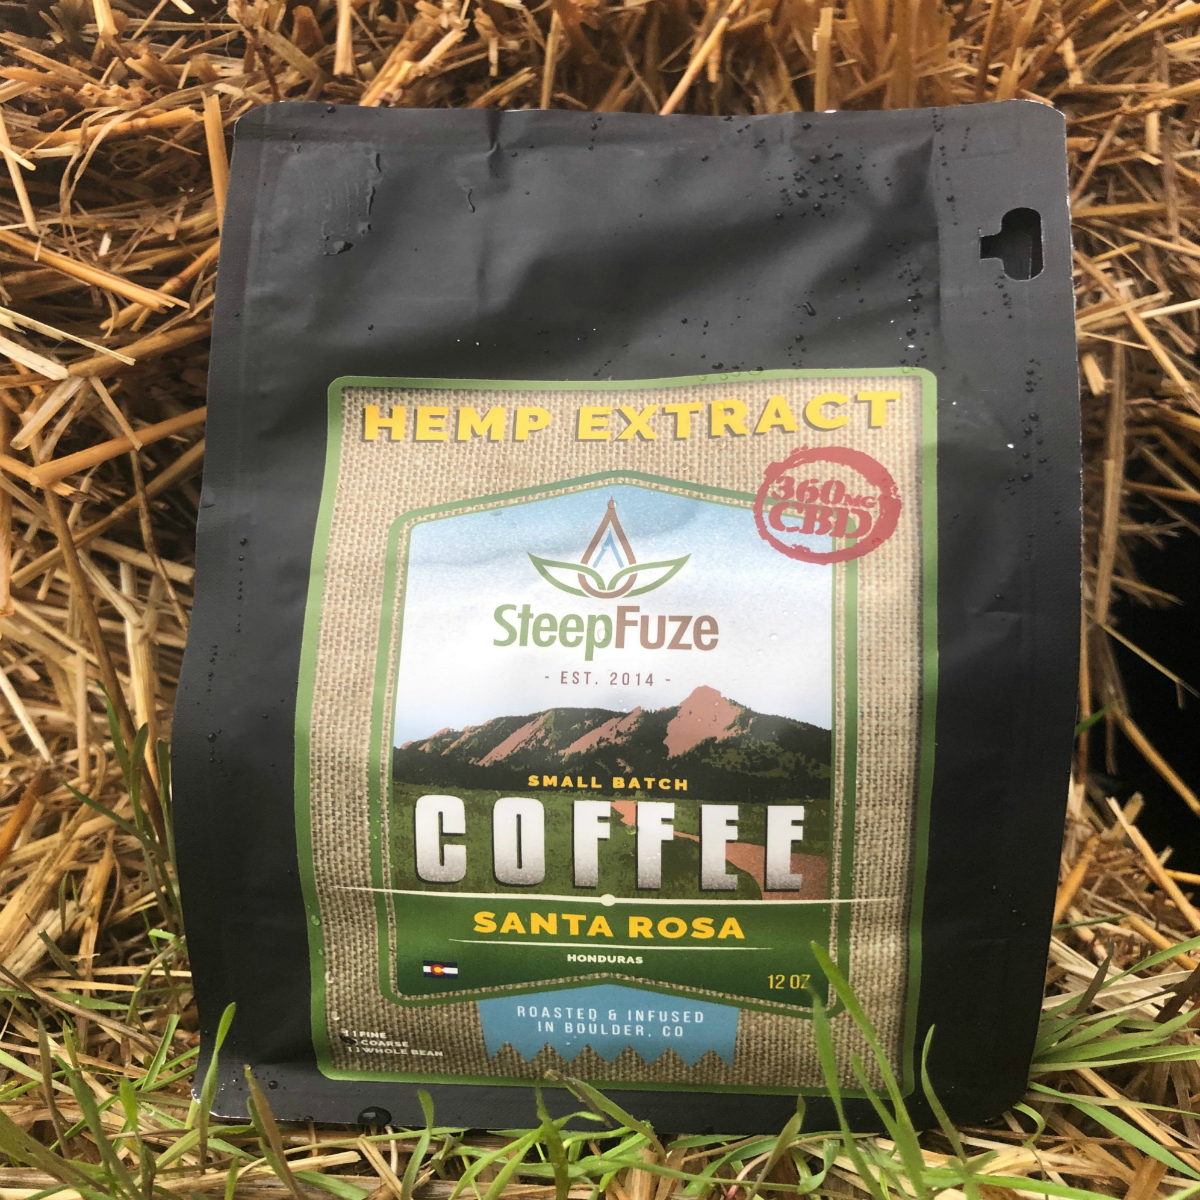 Steep Fuze CBD Coffee Santa Rosa